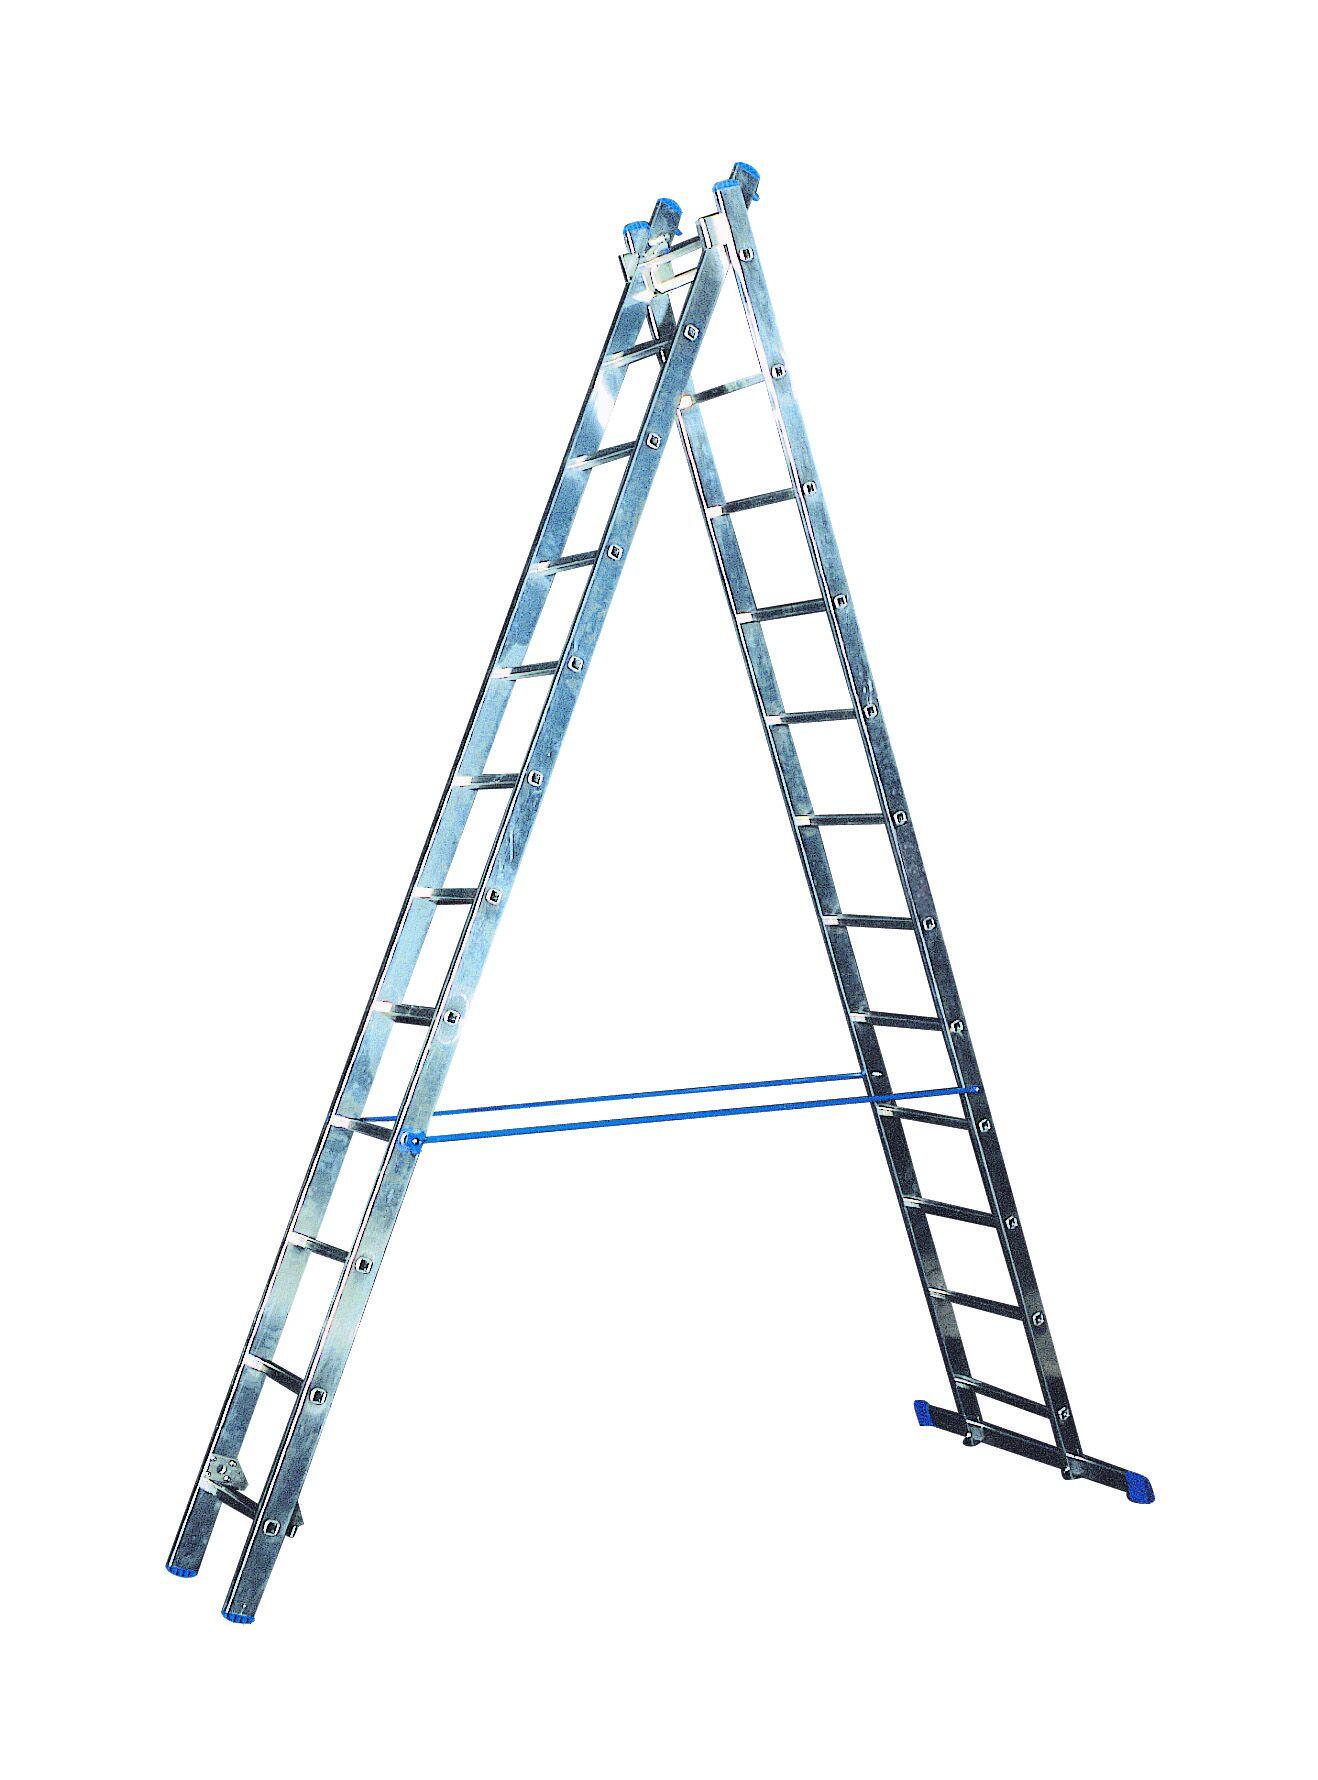 Žebřík hliníkový víceučelový HOBBY VHR H 2x14 Al